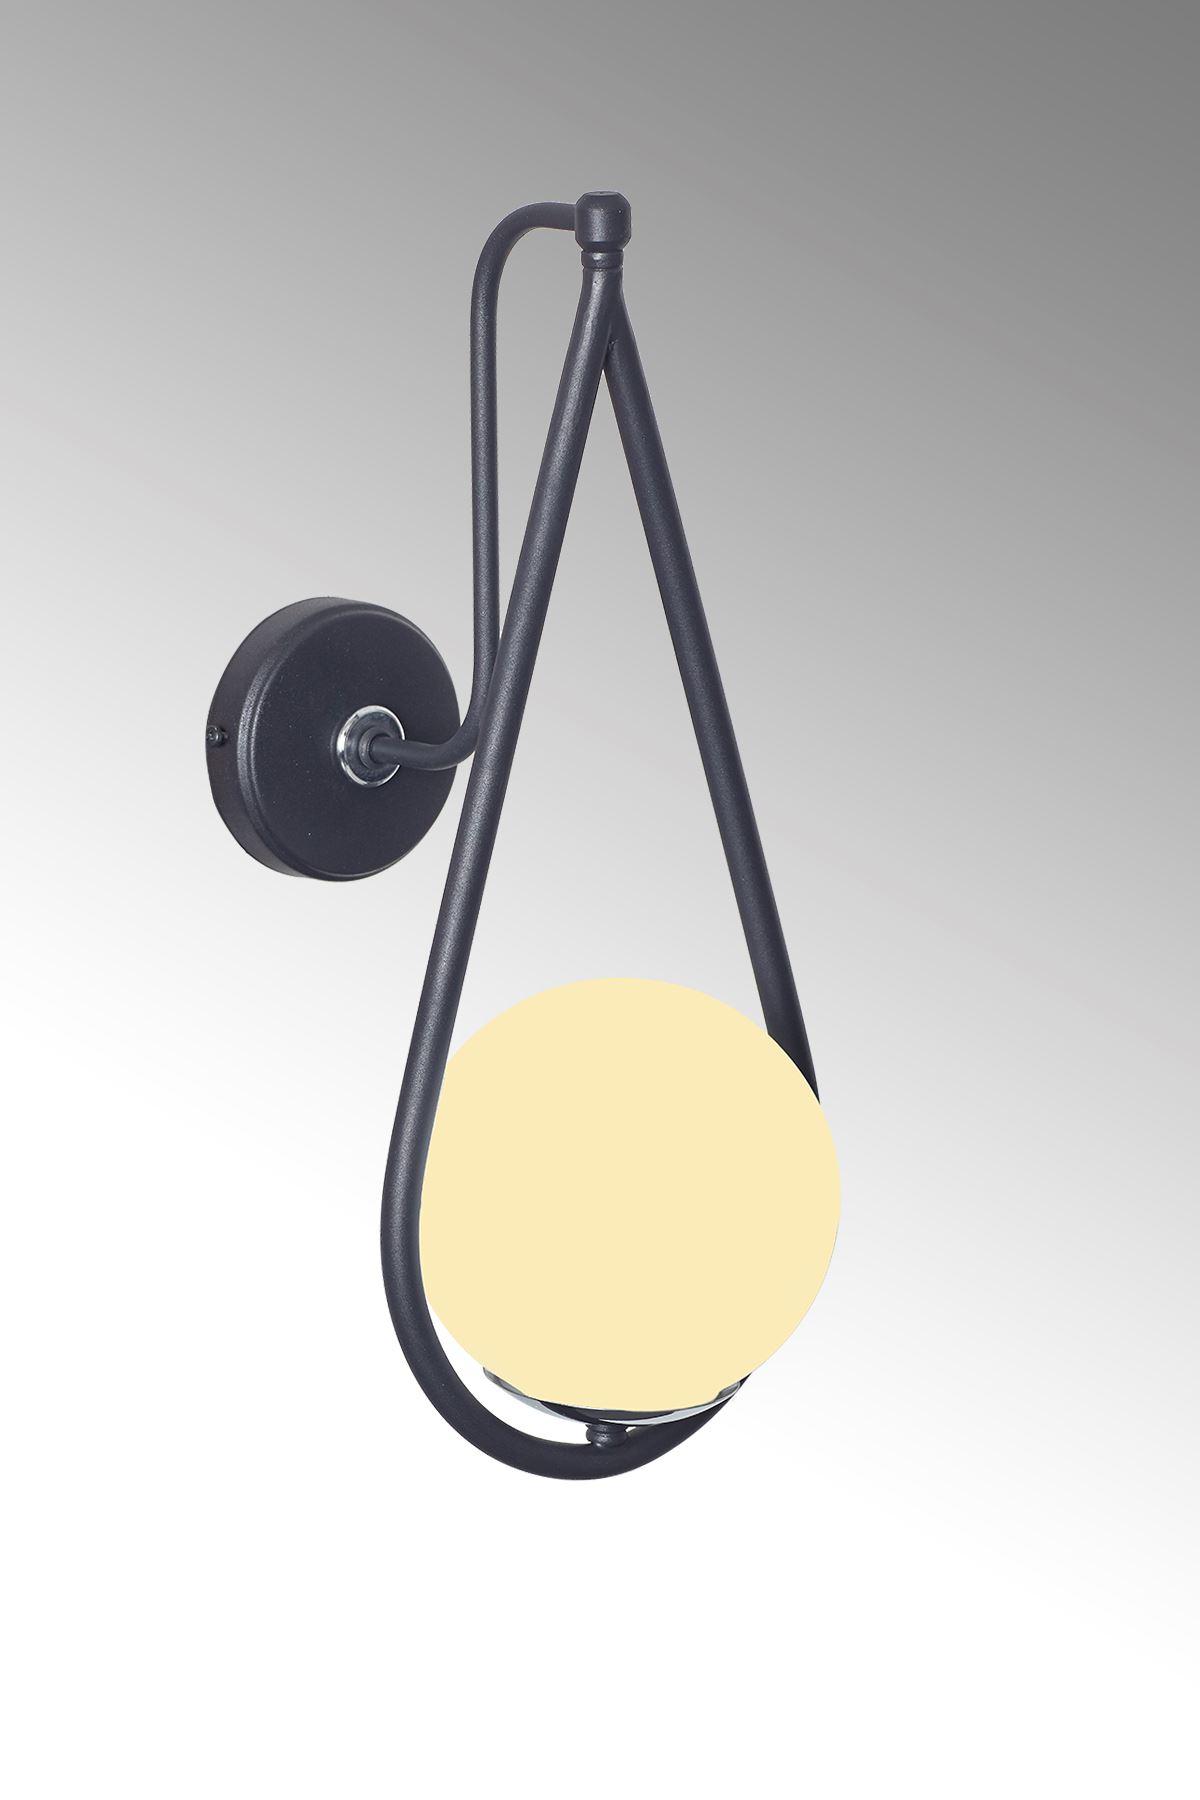 Siena Krom-Siyah Metal Gövde Beyaz Camlı Tasarım Lüx Aplik